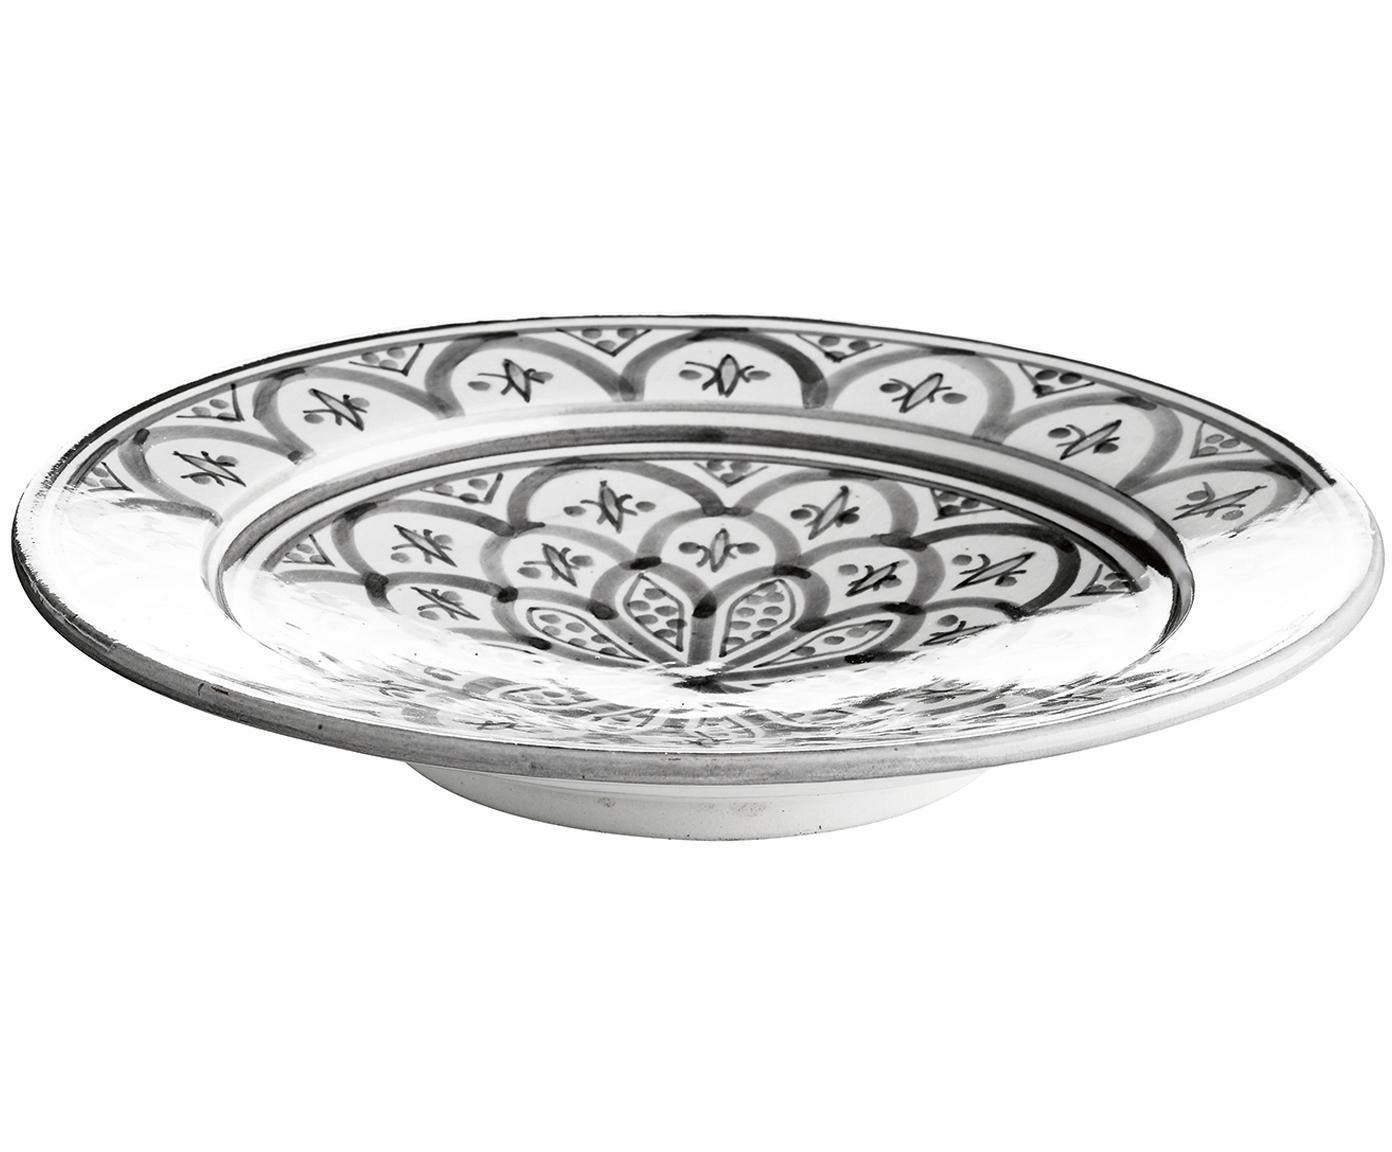 Schale Nanna, Keramik, handbemalt, Schwarz, Weiß, Ø 25 x H 6 cm